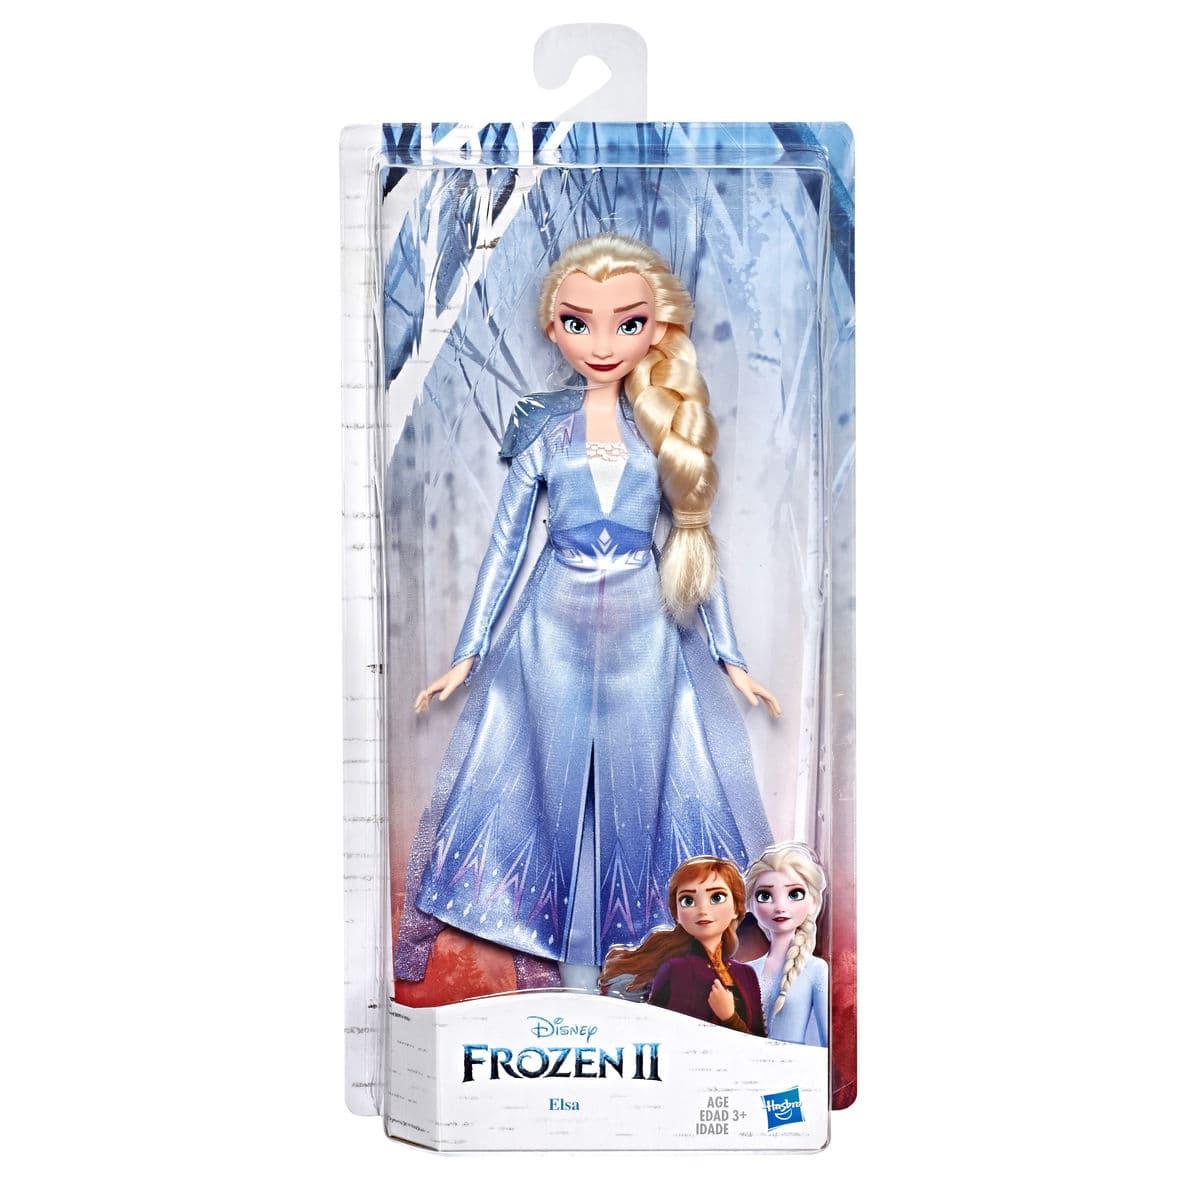 Disney Frozen II Elsa Puppe mit Outfit